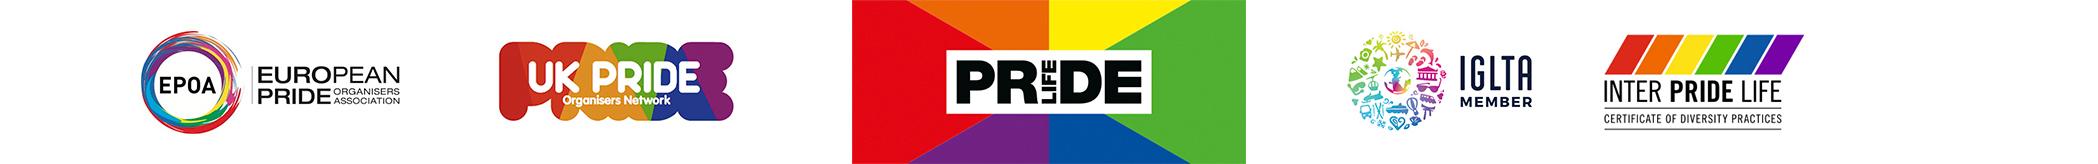 Pride Life